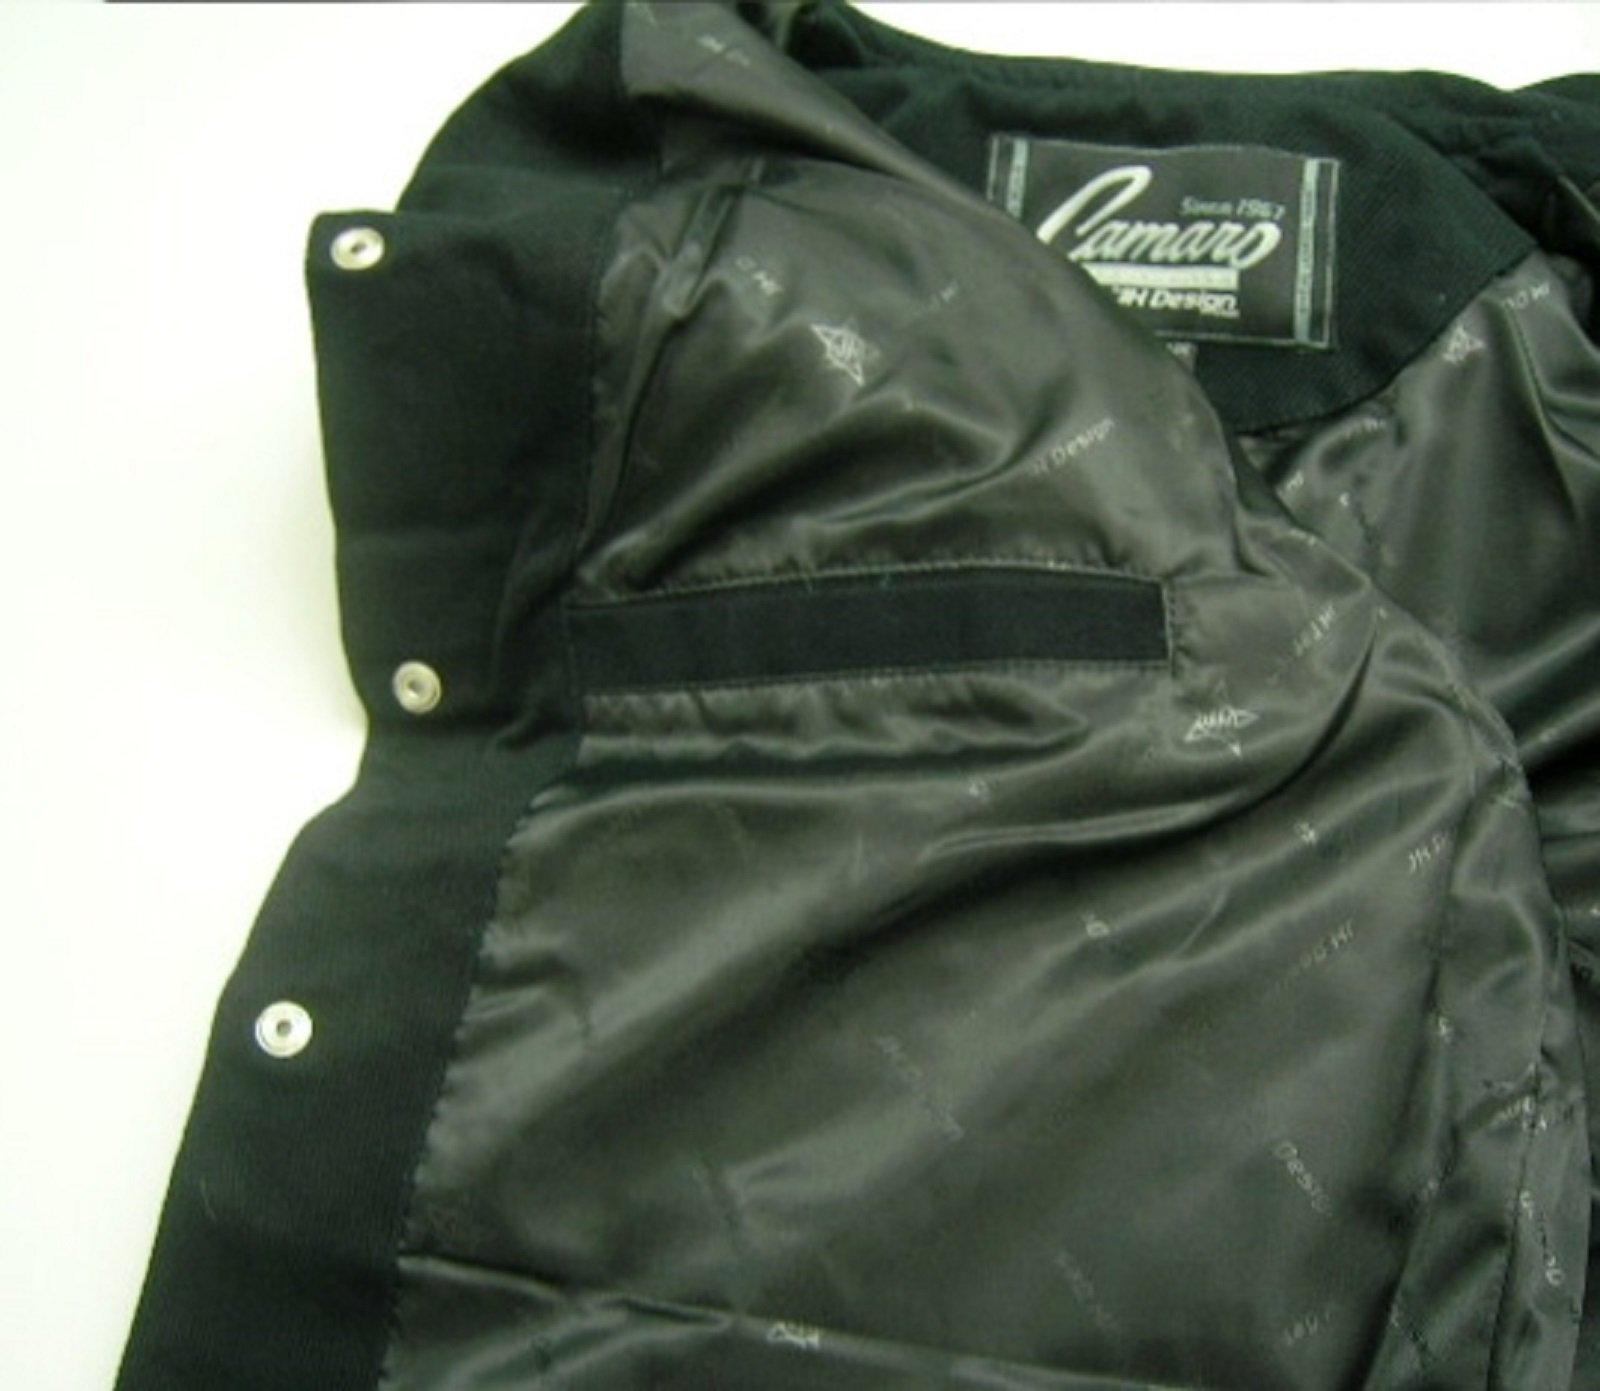 J.H. Design JH Design Chevy Camaro Cotton Twill Jacket, XXX-Large, Black by J.H. Design (Image #4)